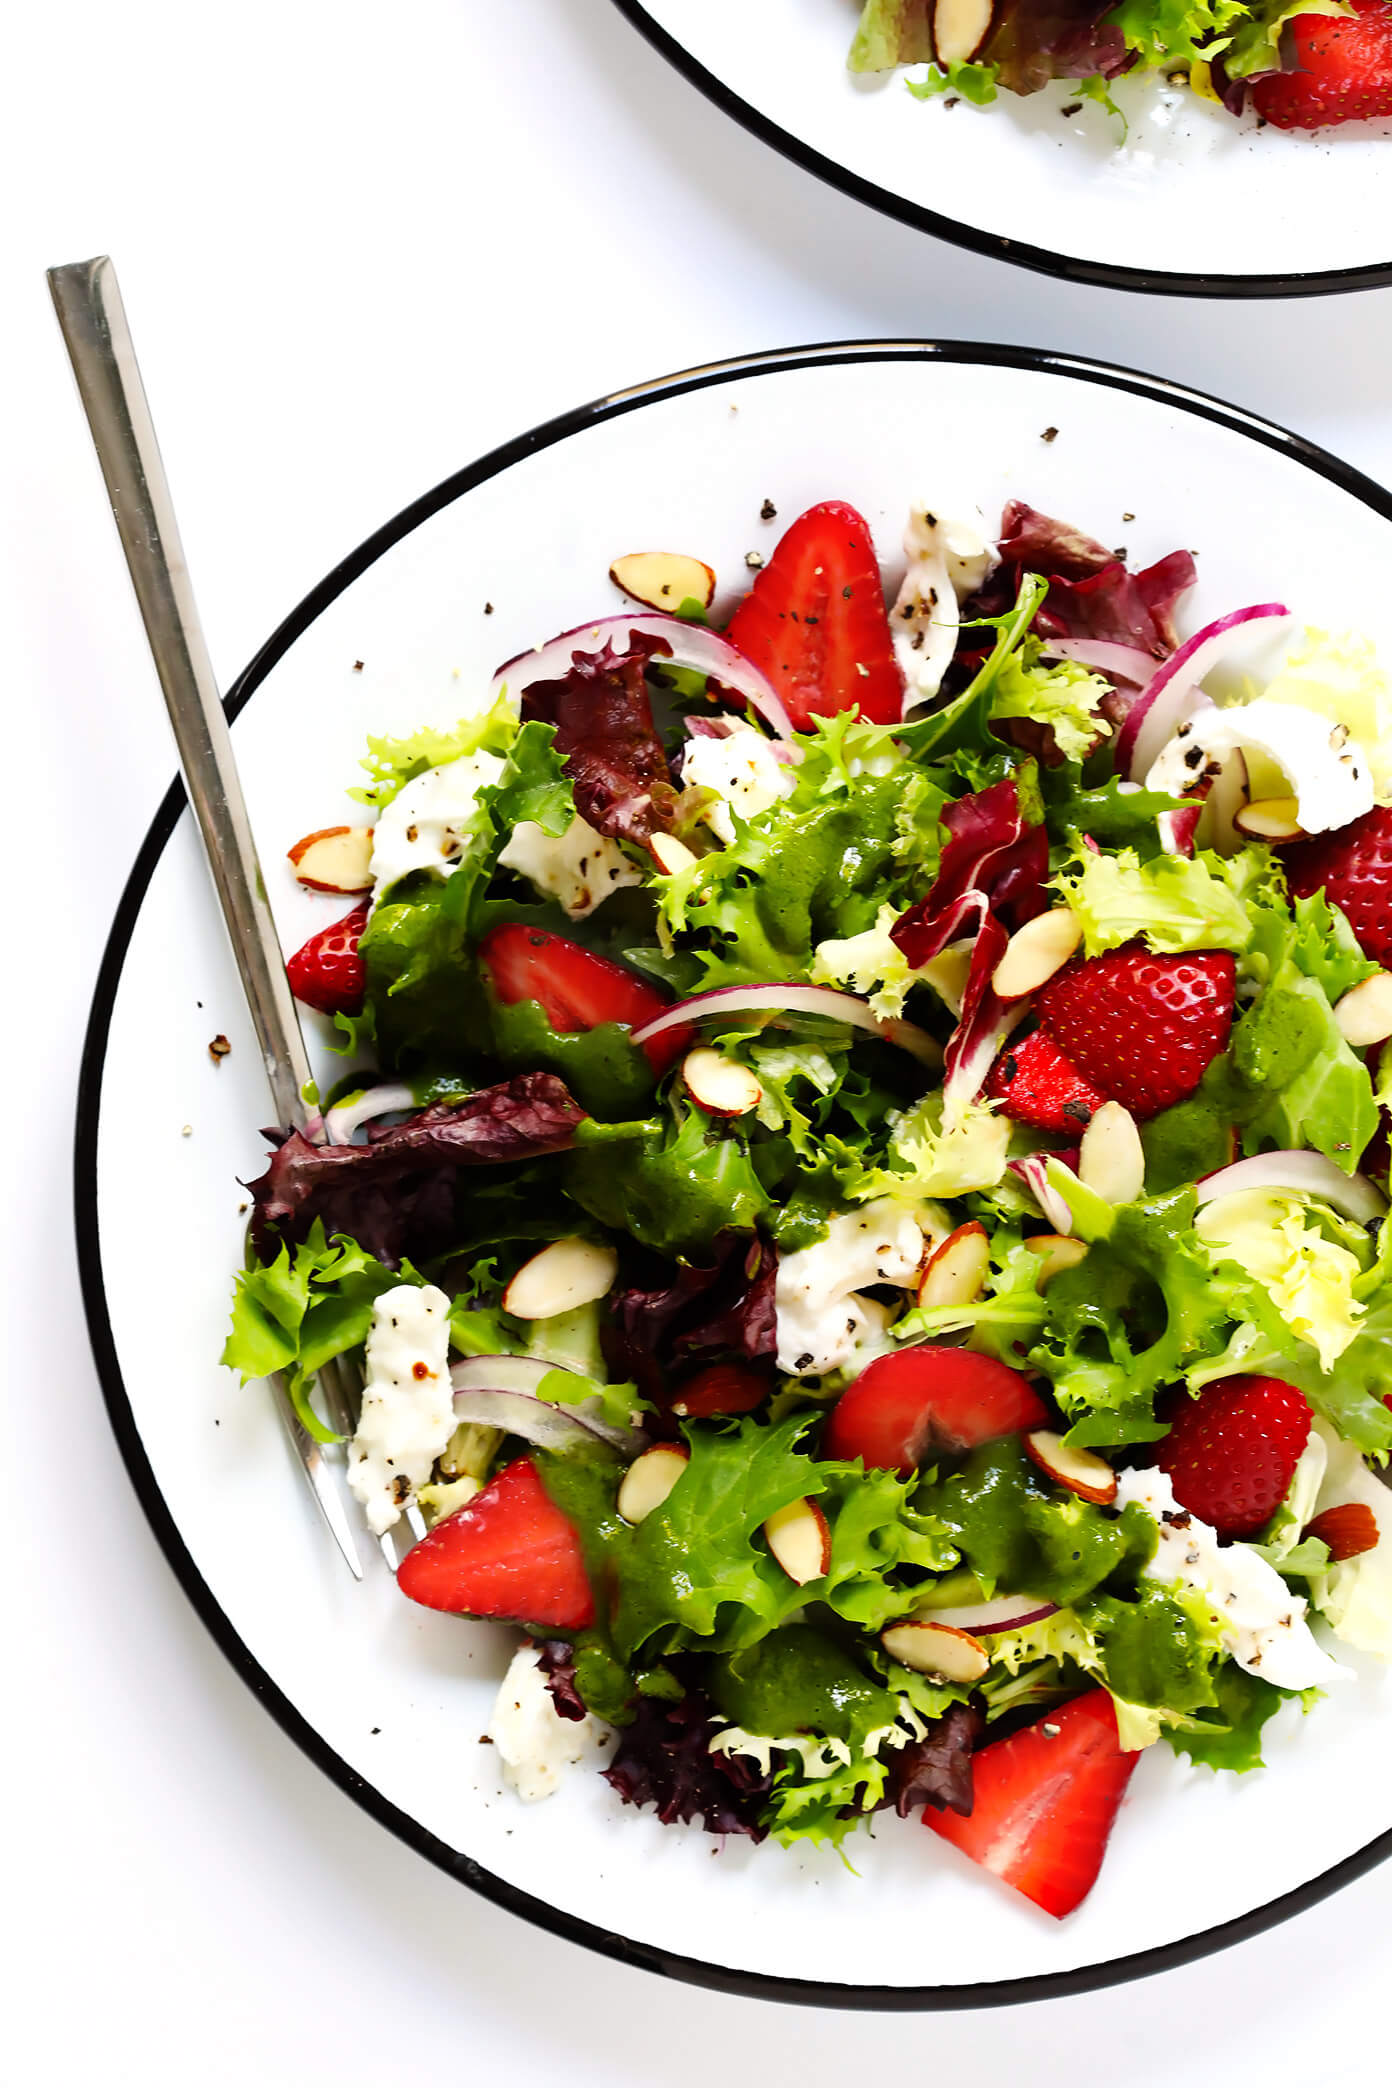 Summer Strawberry Burrata Salad with Italian Vinaigrette